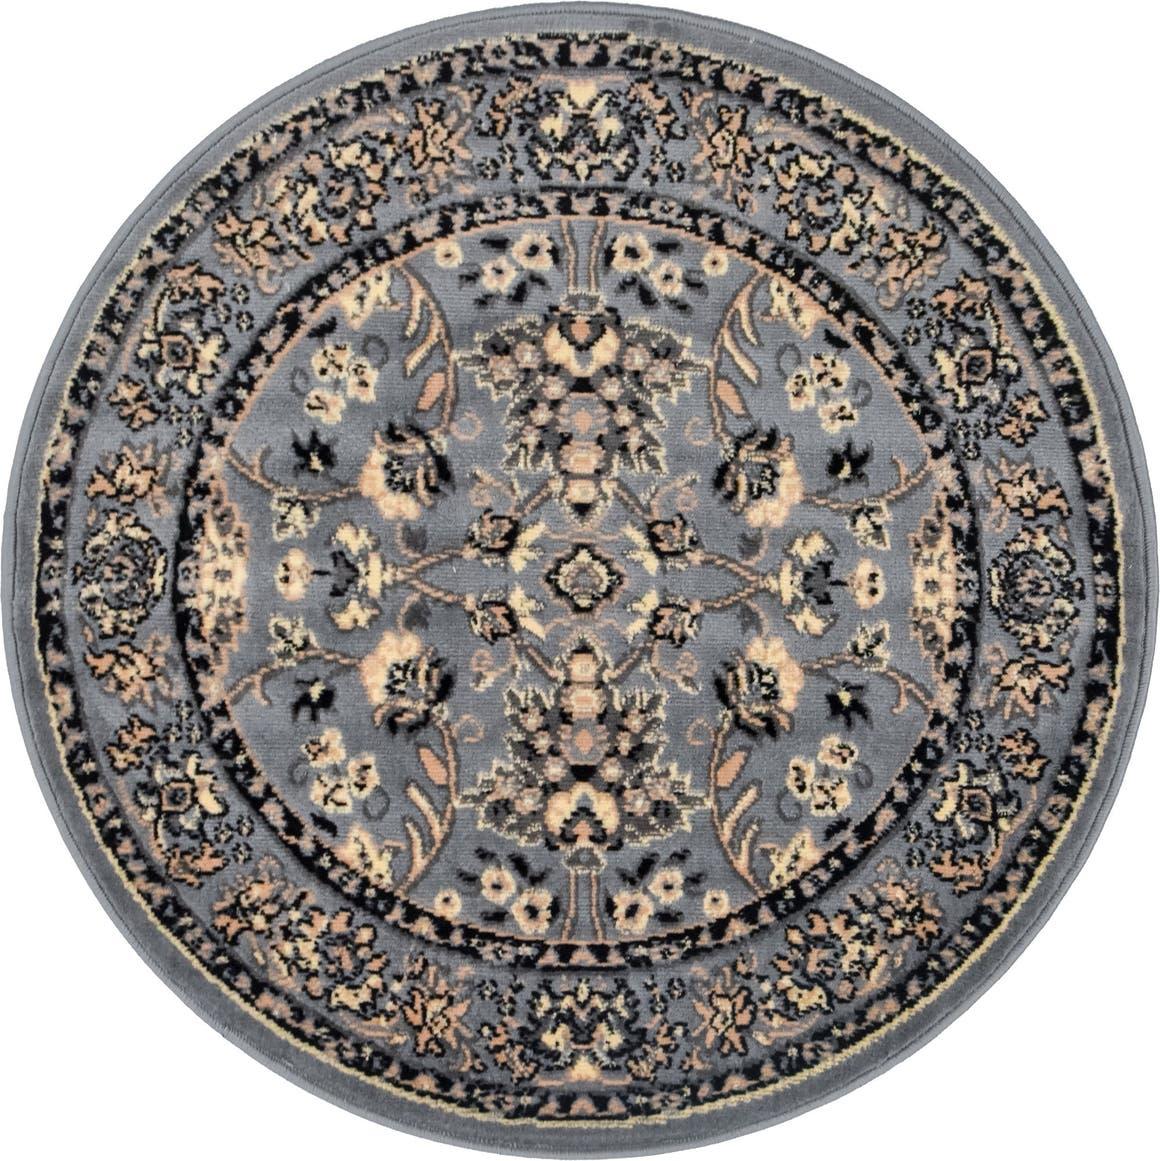 3' 3 x 3' 3 Kashan Design Round Rug main image